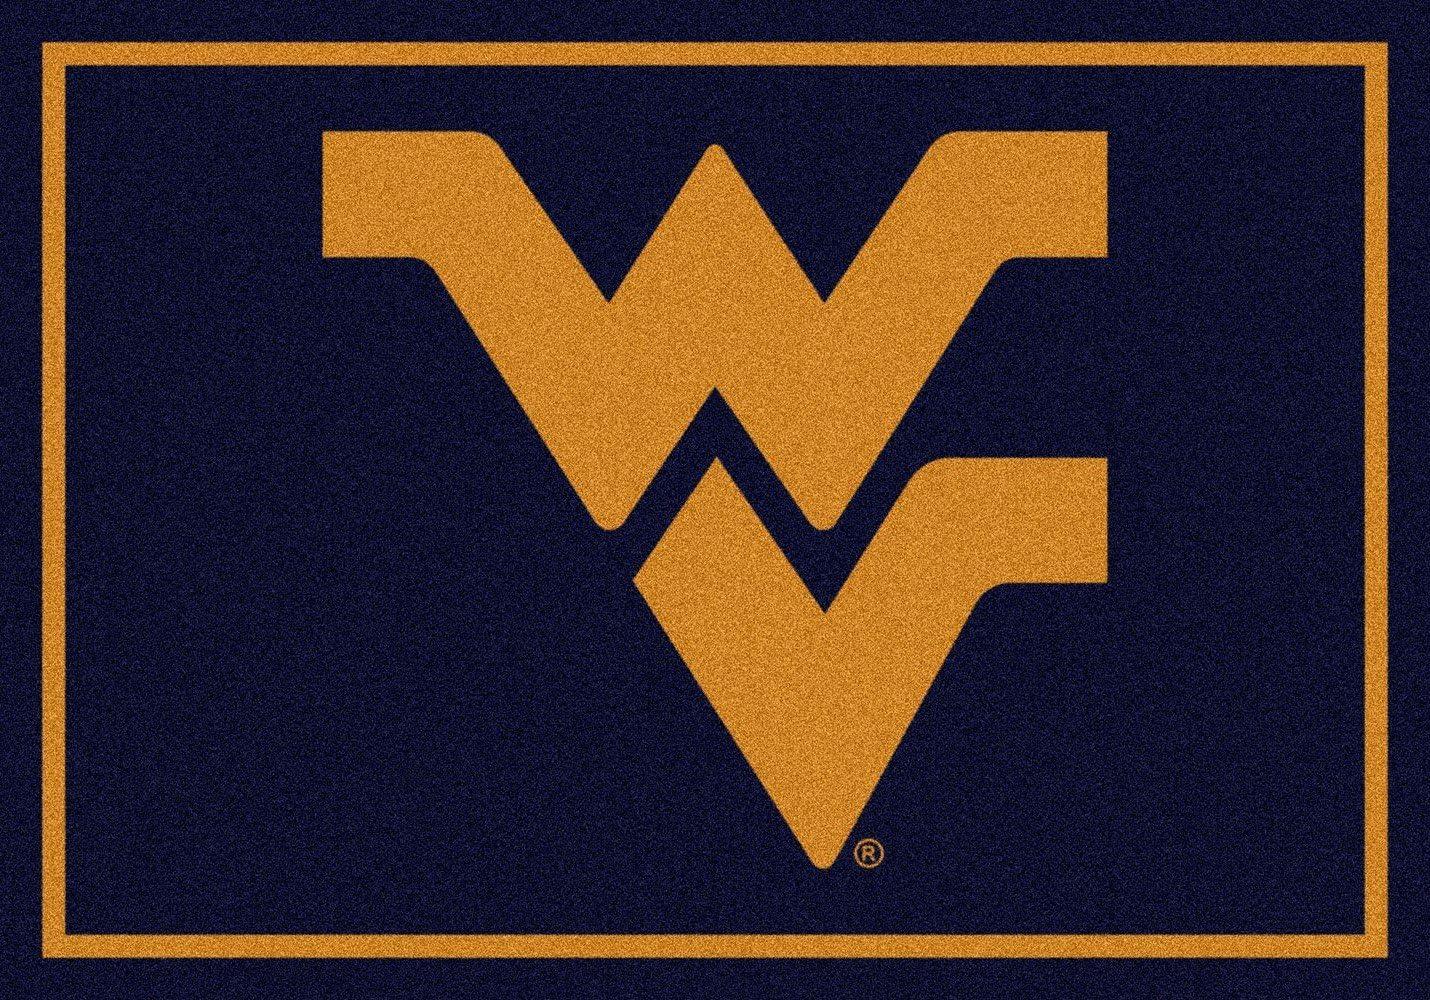 Milliken West Virginia College Team Spirit Area Rug, 5 4 x 7 8